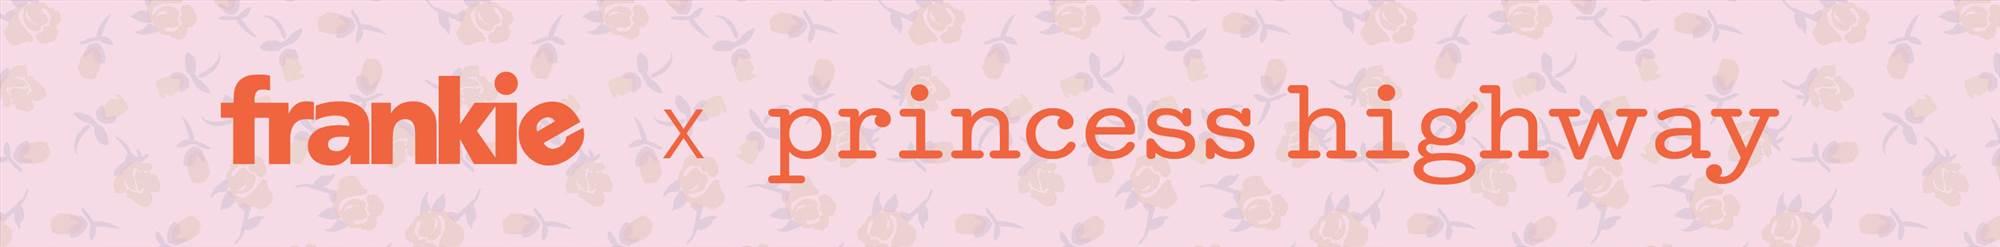 frankie x princess highway